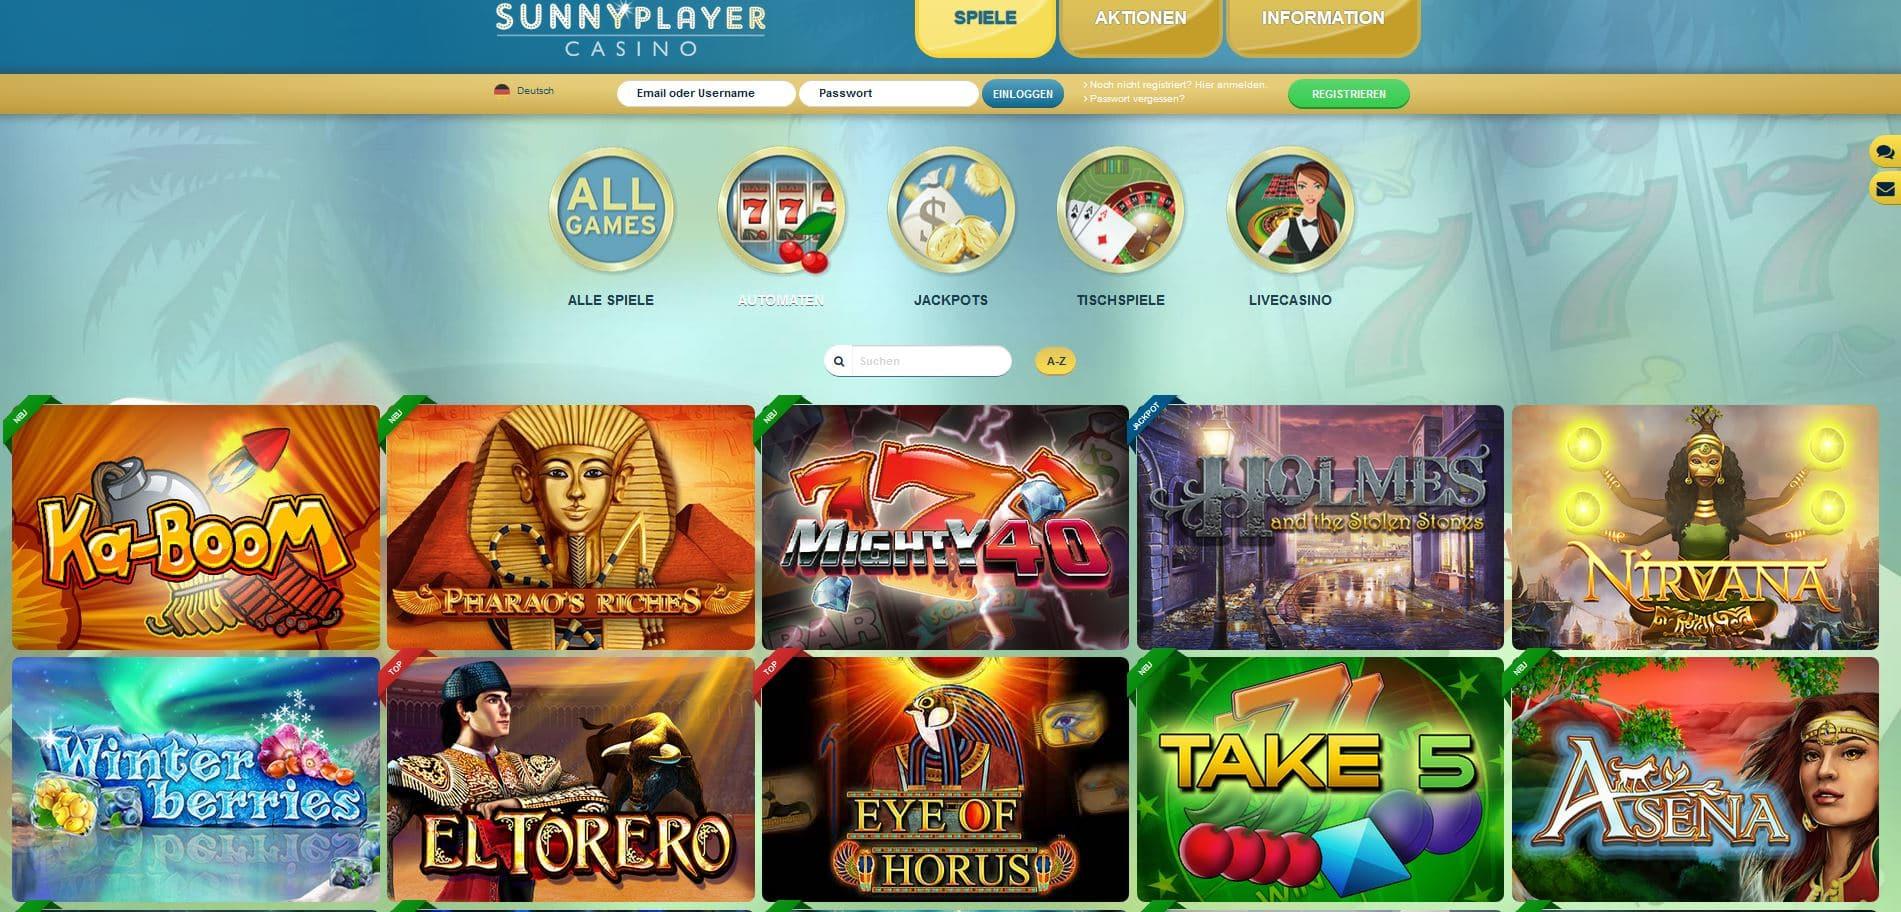 sunnyplayer-casino-spiele